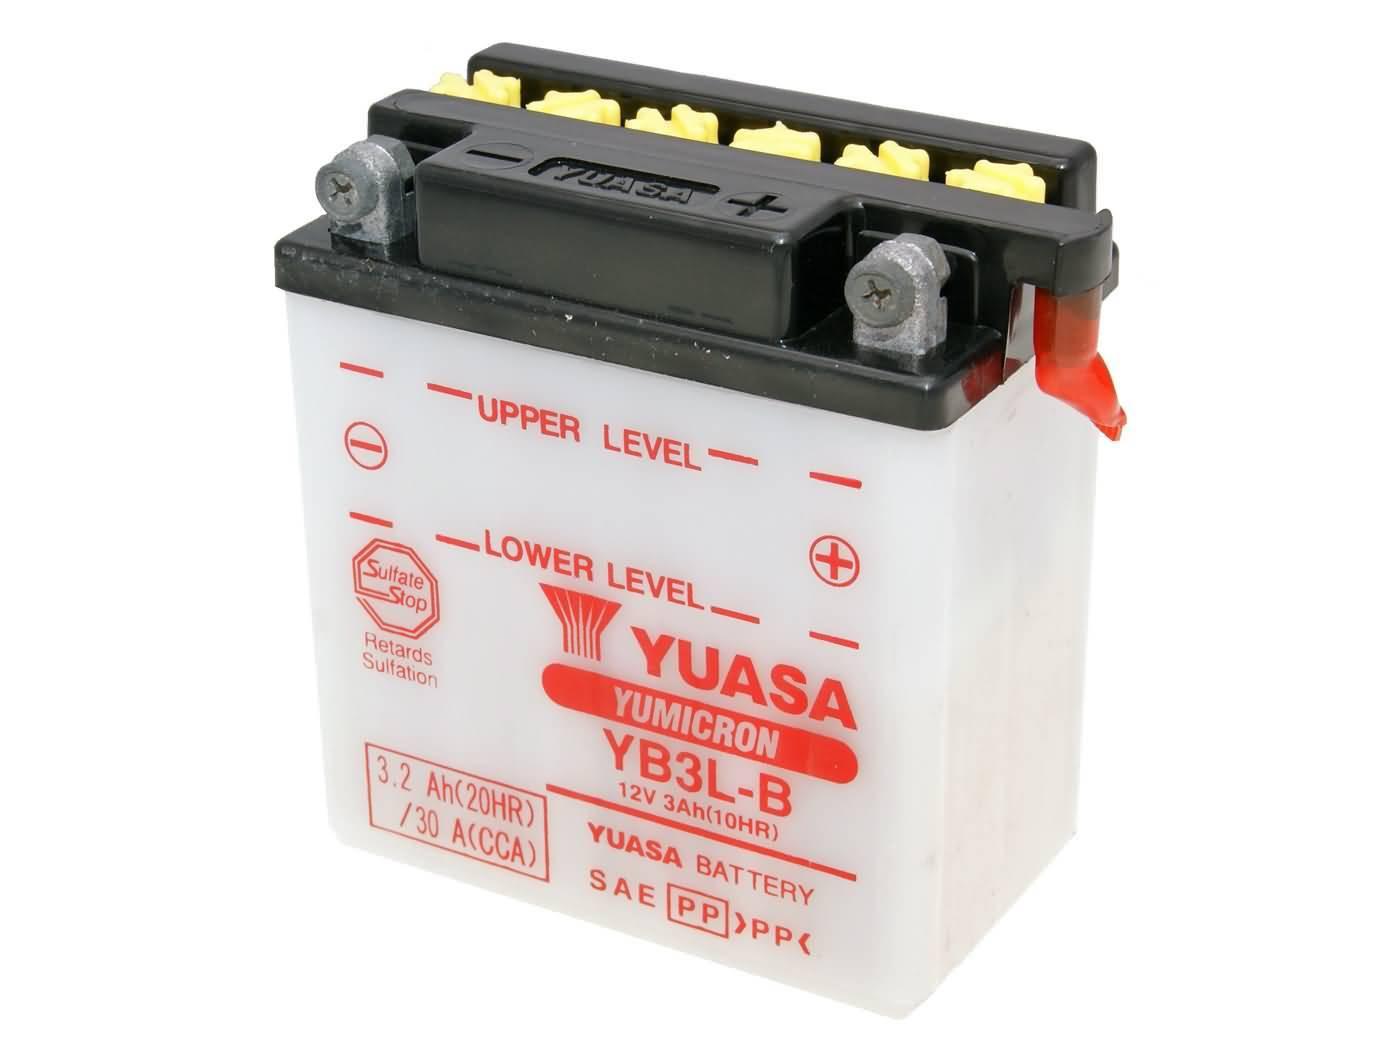 Yuasa YuMicron YB3L-B akkumulátor - savcsomag nélkül